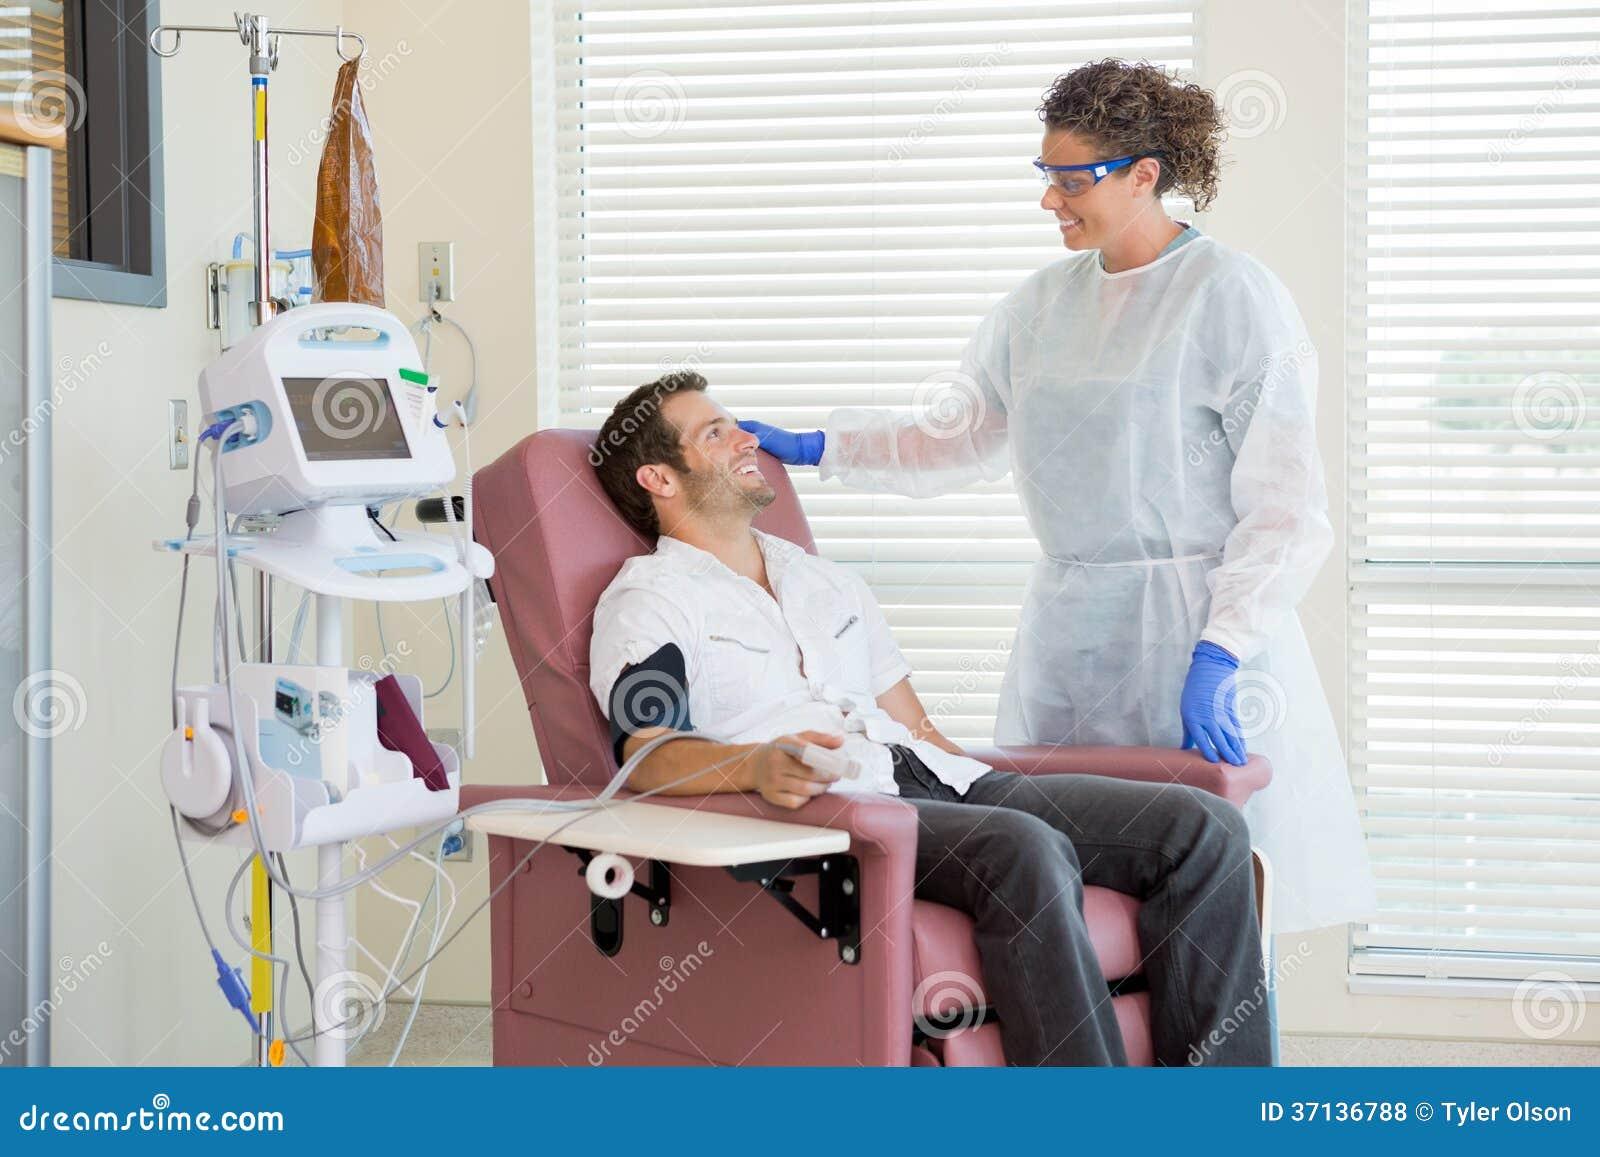 Chemo Patient with Nurse